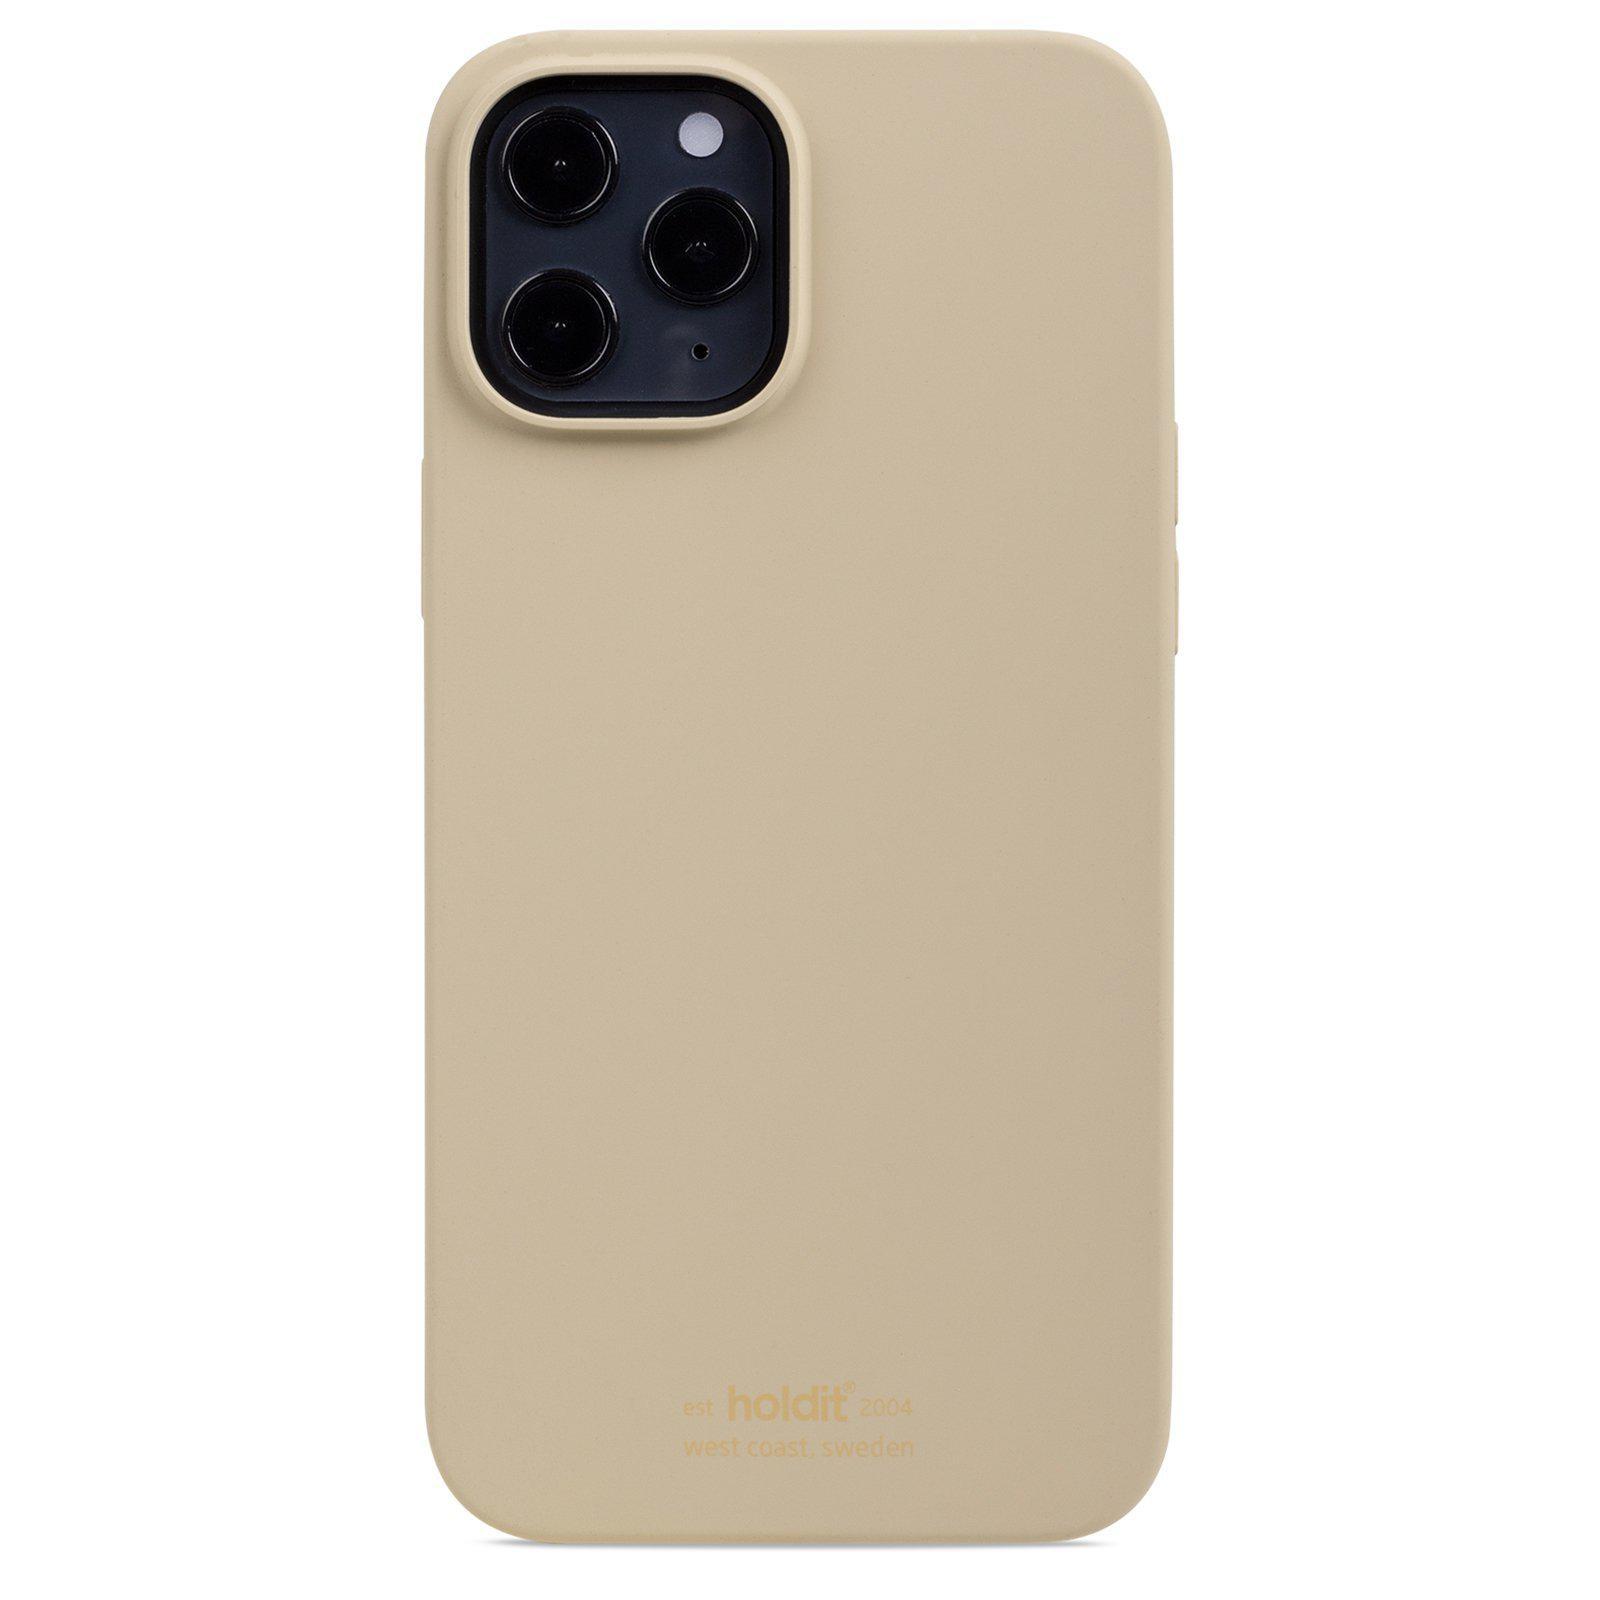 Silikonikuori iPhone 12 Pro Max Beige